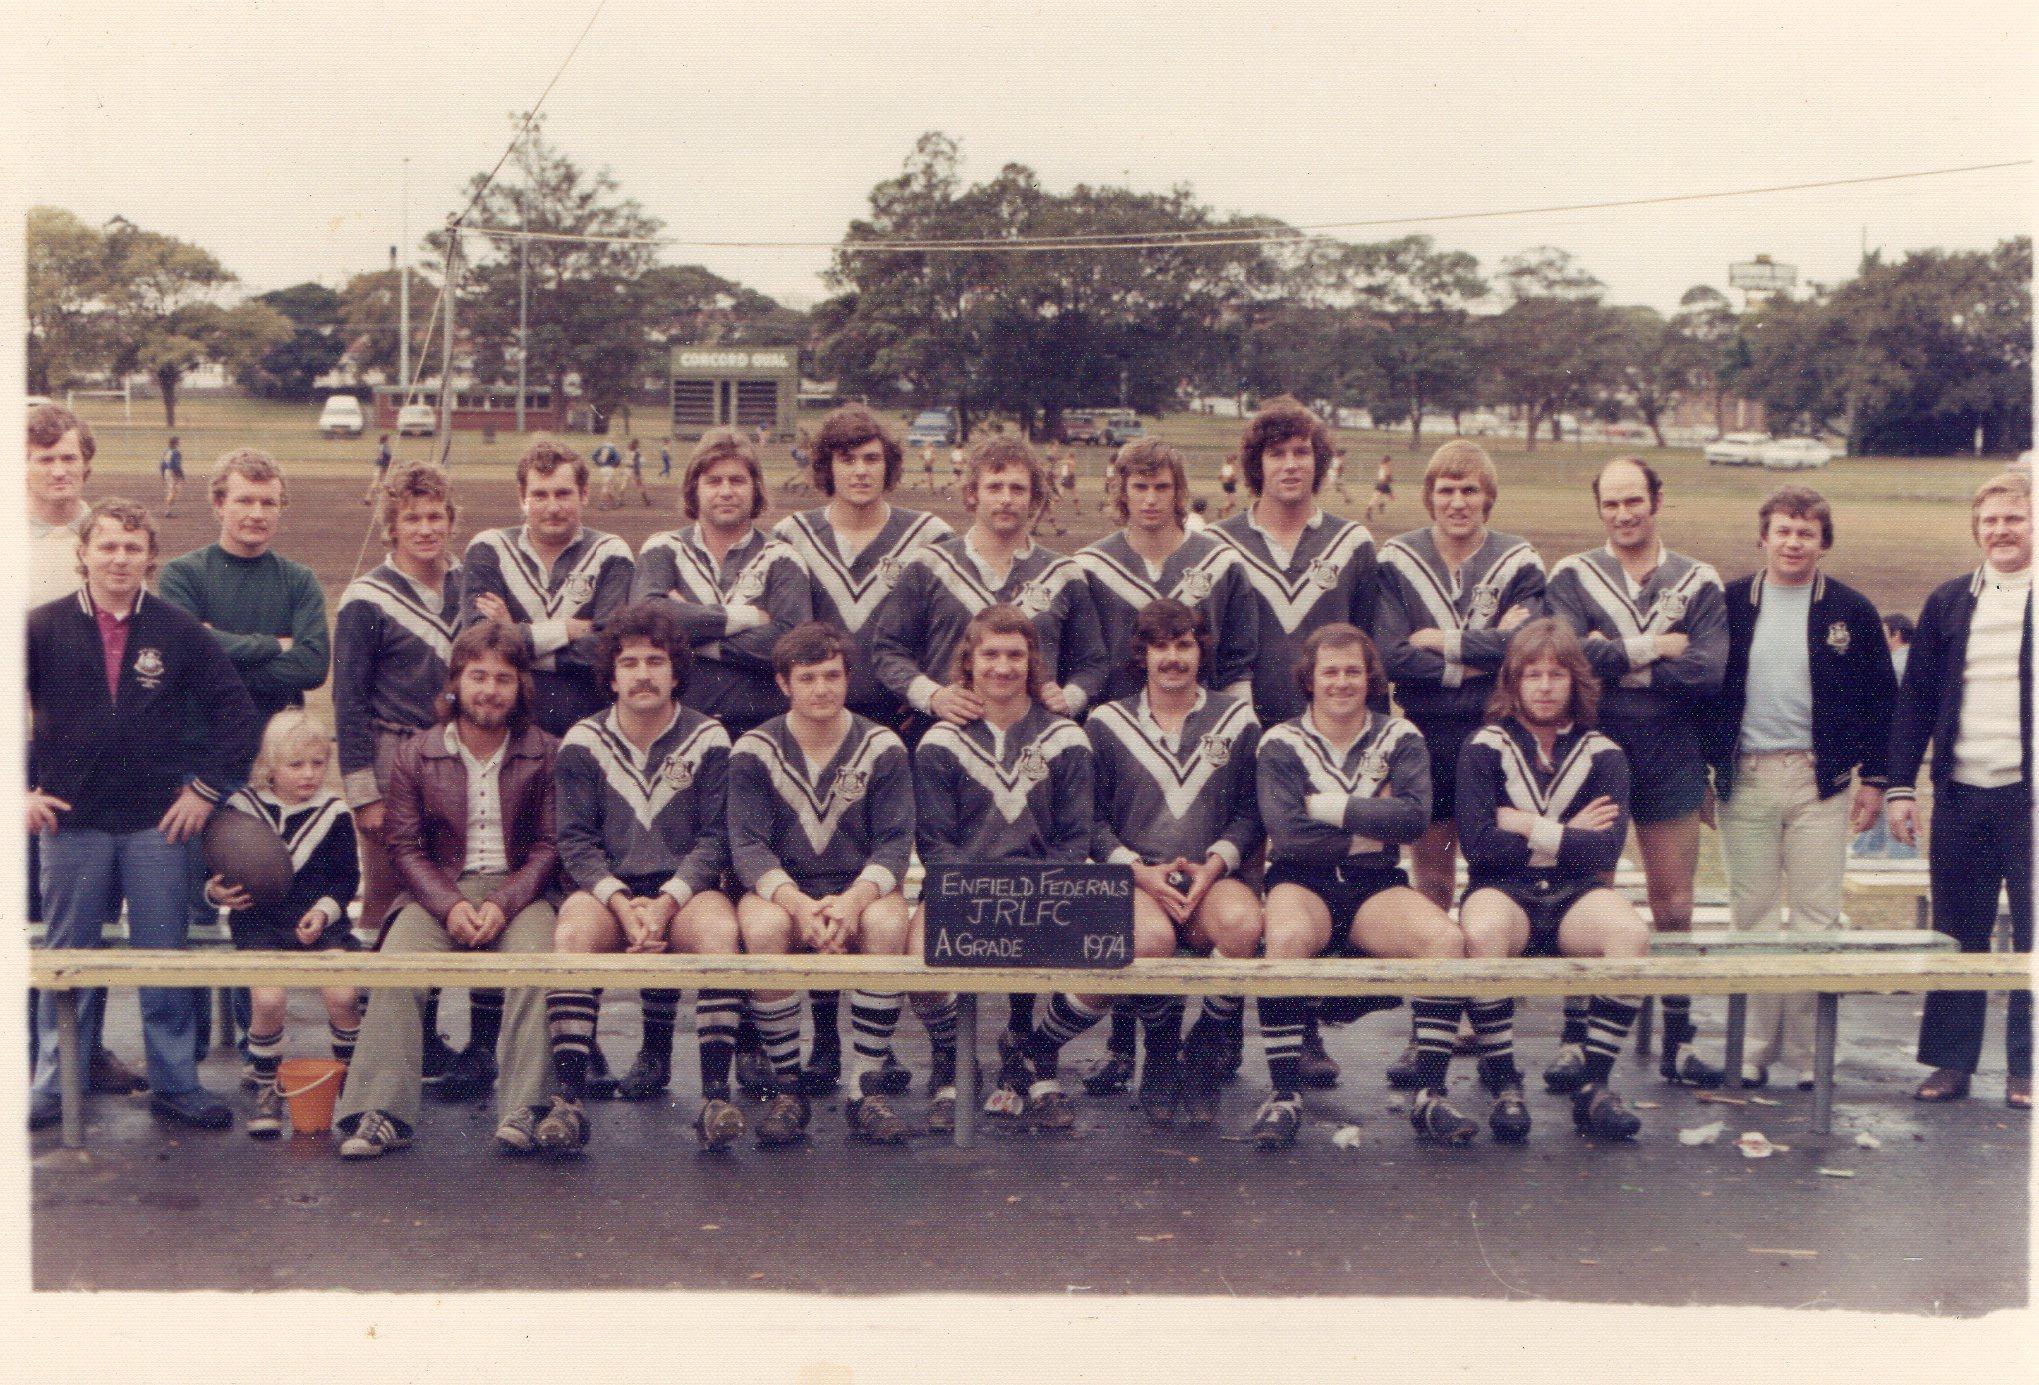 1974 Enfield Federals A Grade Premiers